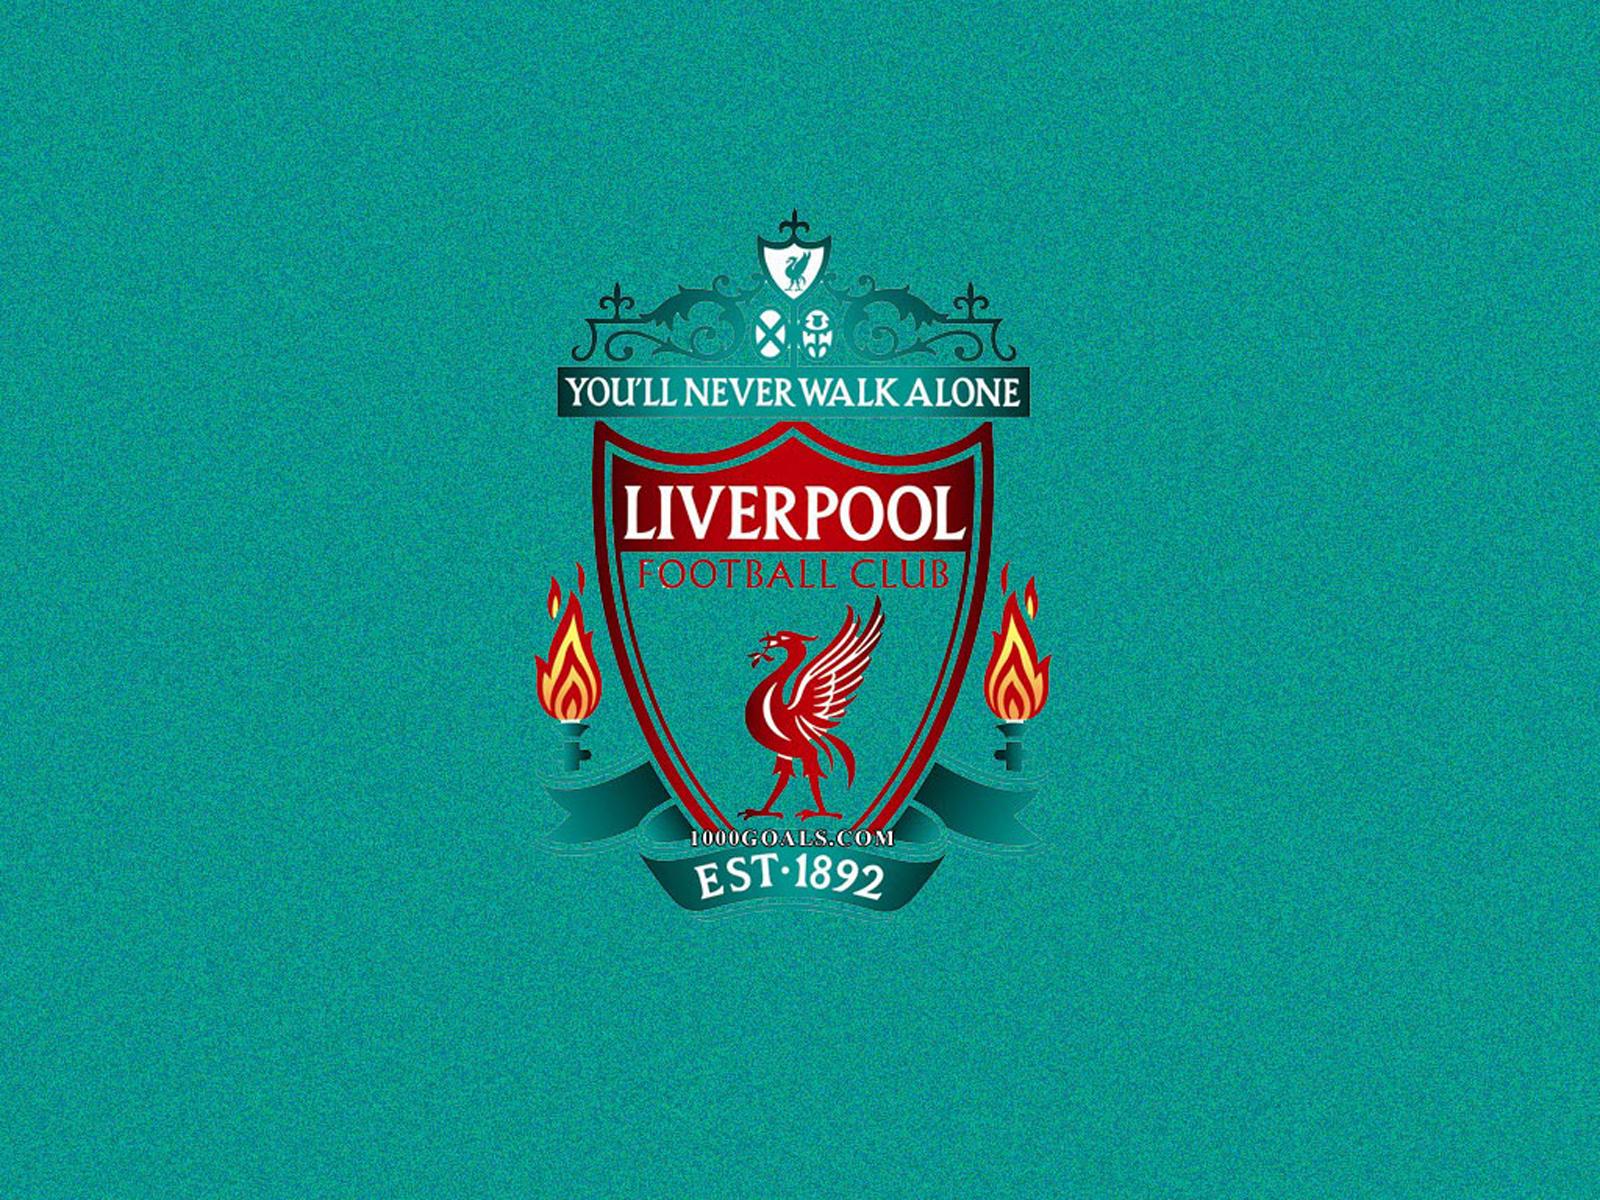 Liverpool Fc Wallpaper Hd  Liverpool Wallpaper Iphone Size. Liverpool Fc Wallpaper Hd  Liverpool Wallpaper Club Football